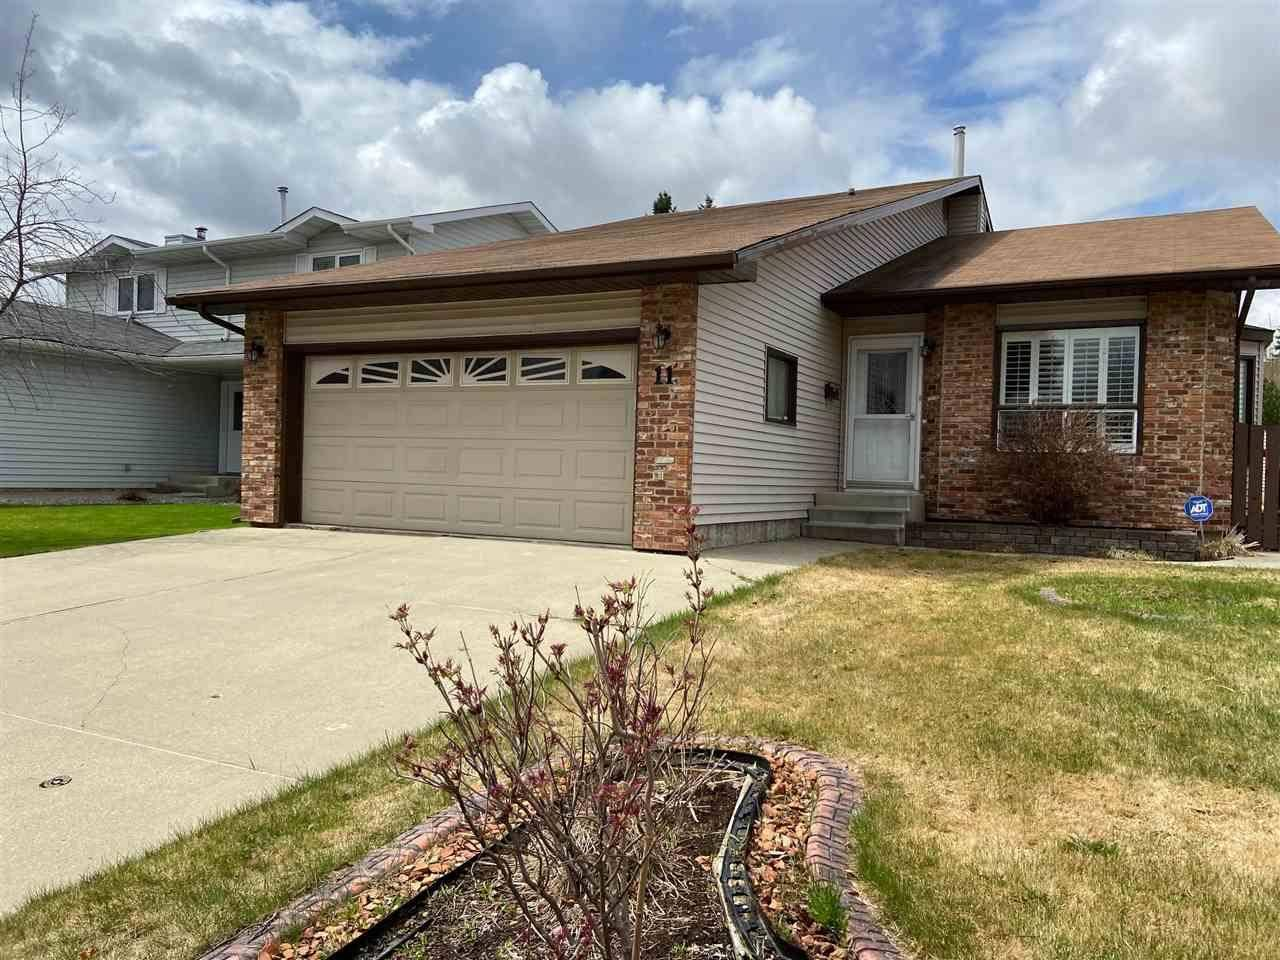 House for sale at 11 Durham Ave St. Albert Alberta - MLS: E4188268